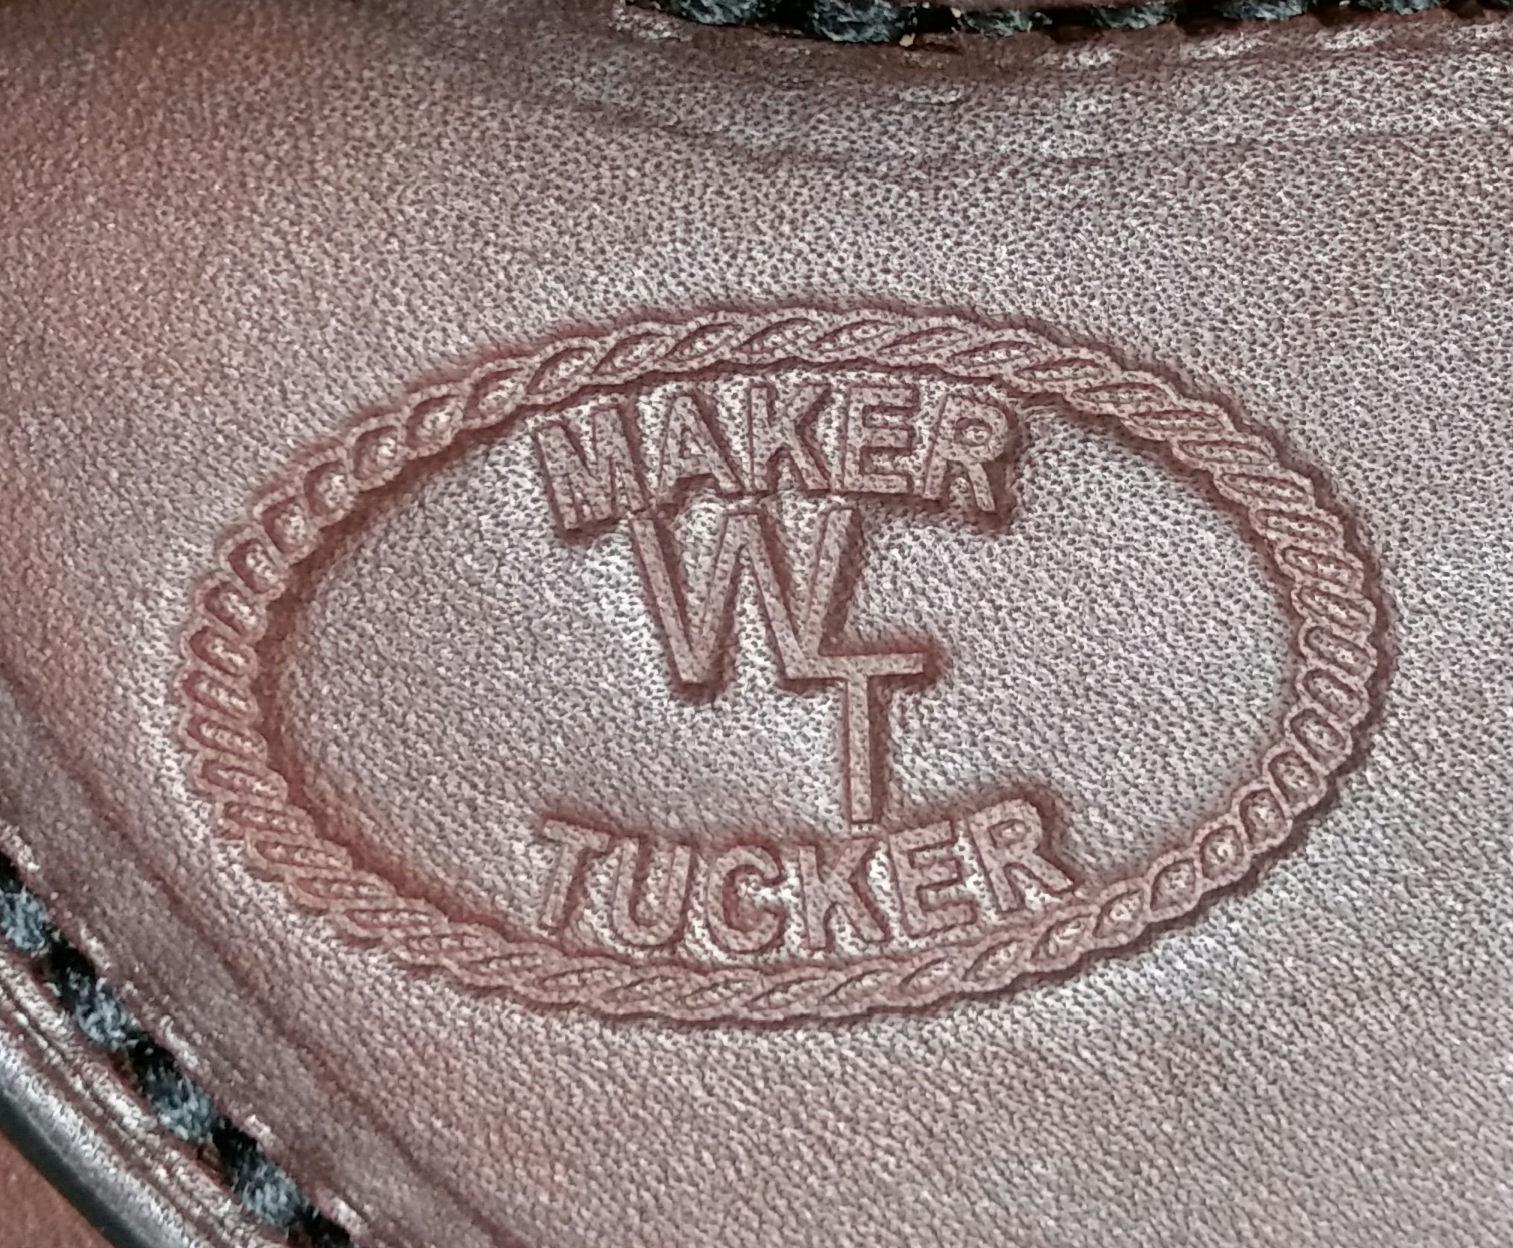 llgg-makermark.jpg